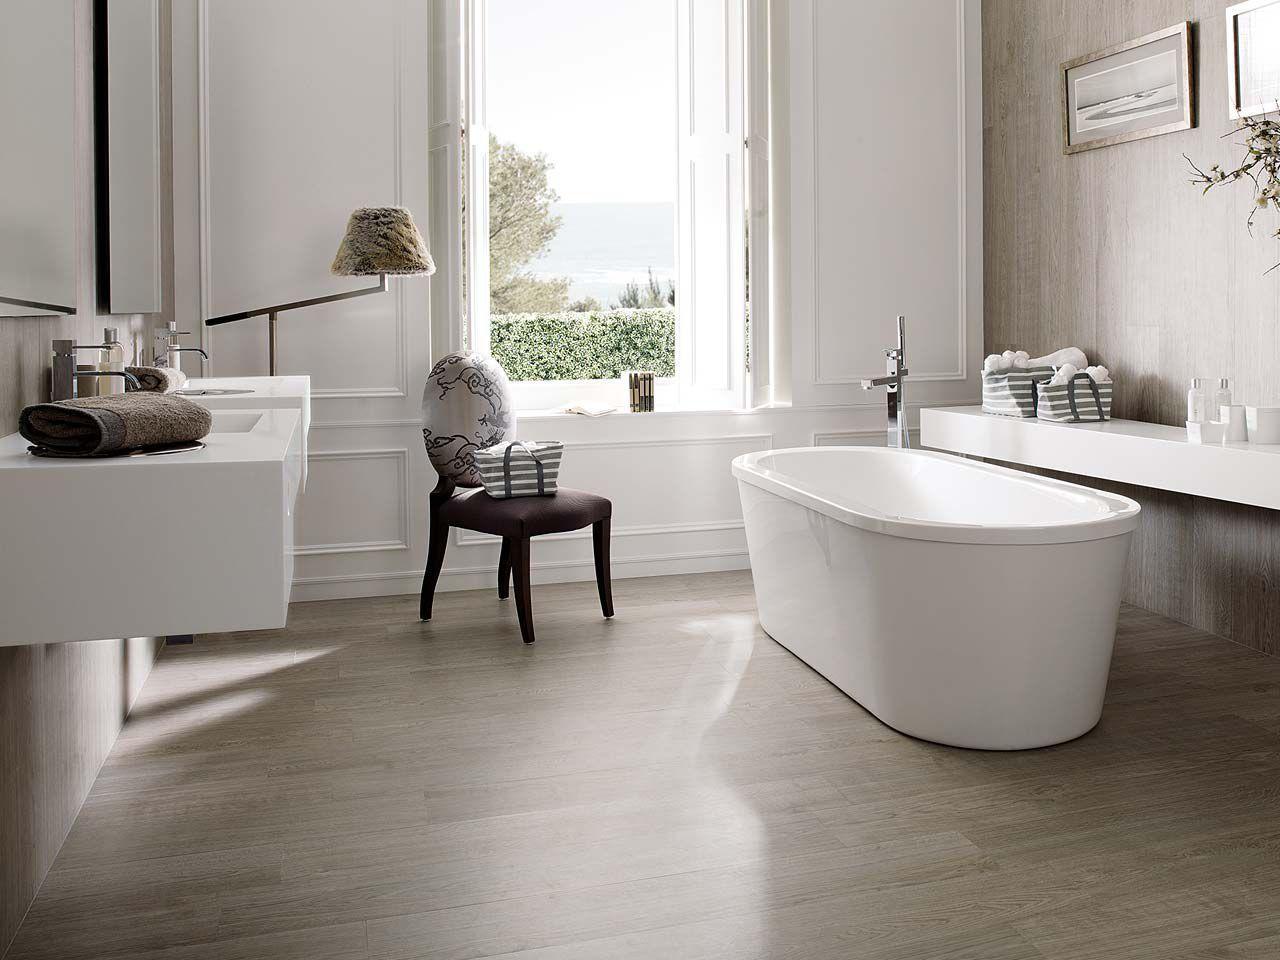 Bathroom tile / indoor / floor / porcelain stoneware PAR-KER ...